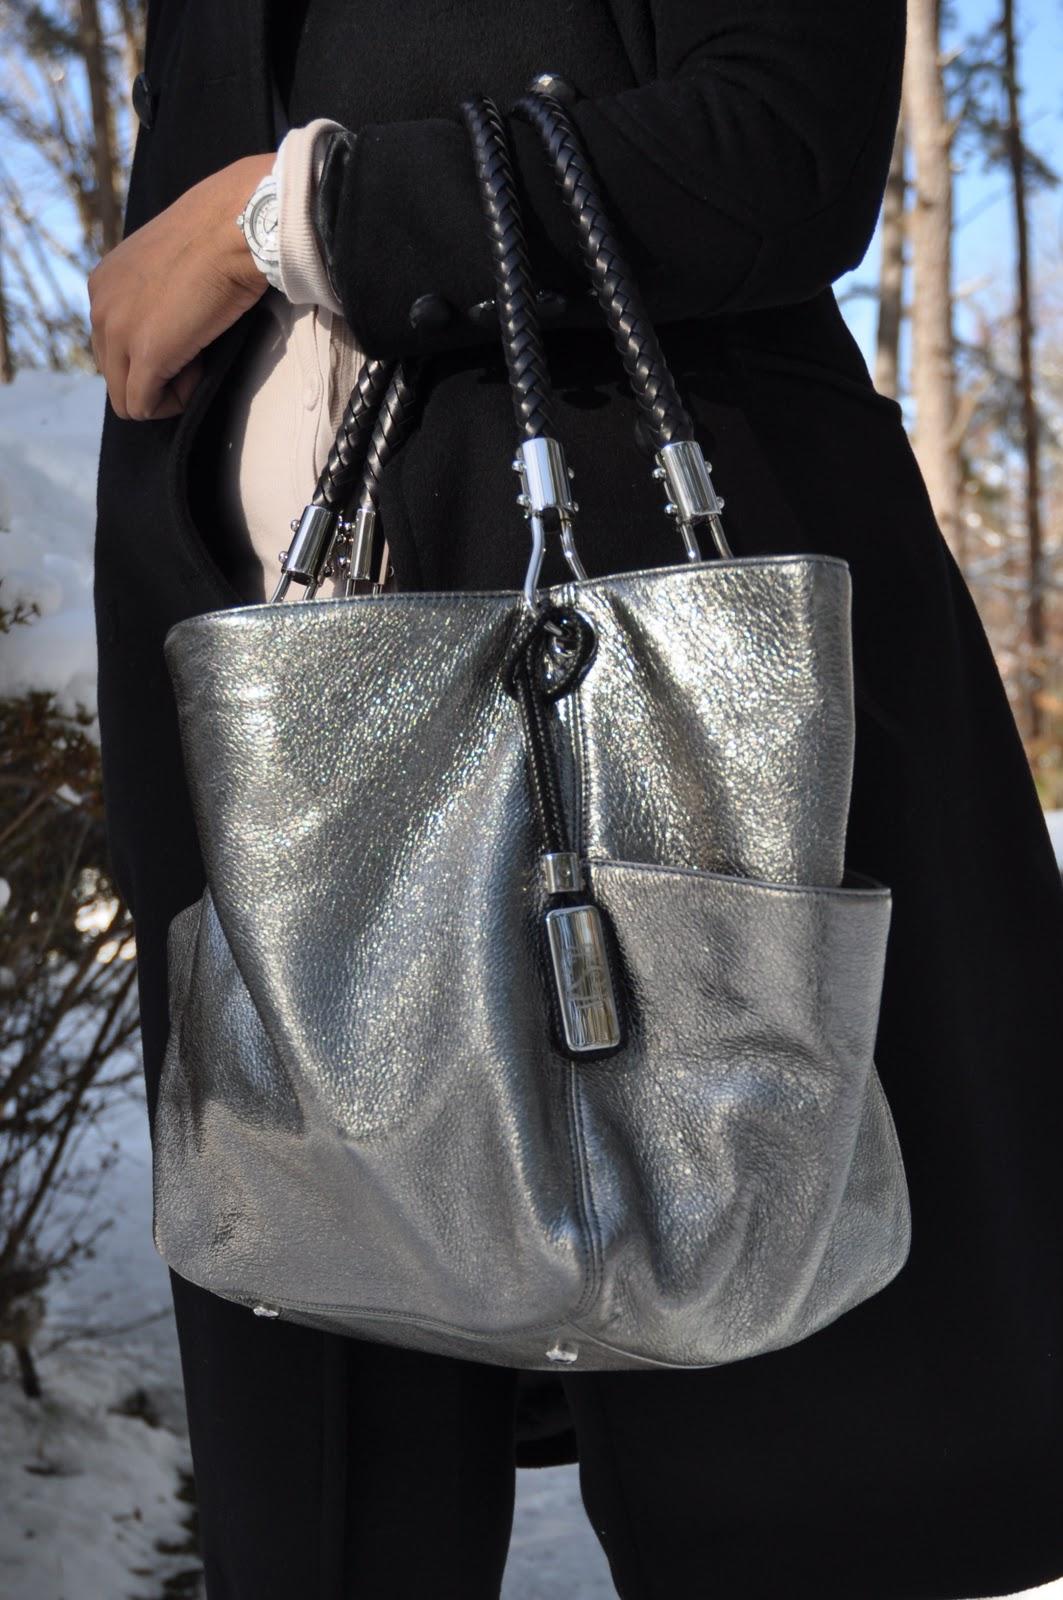 Naina Singla - fashion stylist and style expert - Blog e835435e64ca4